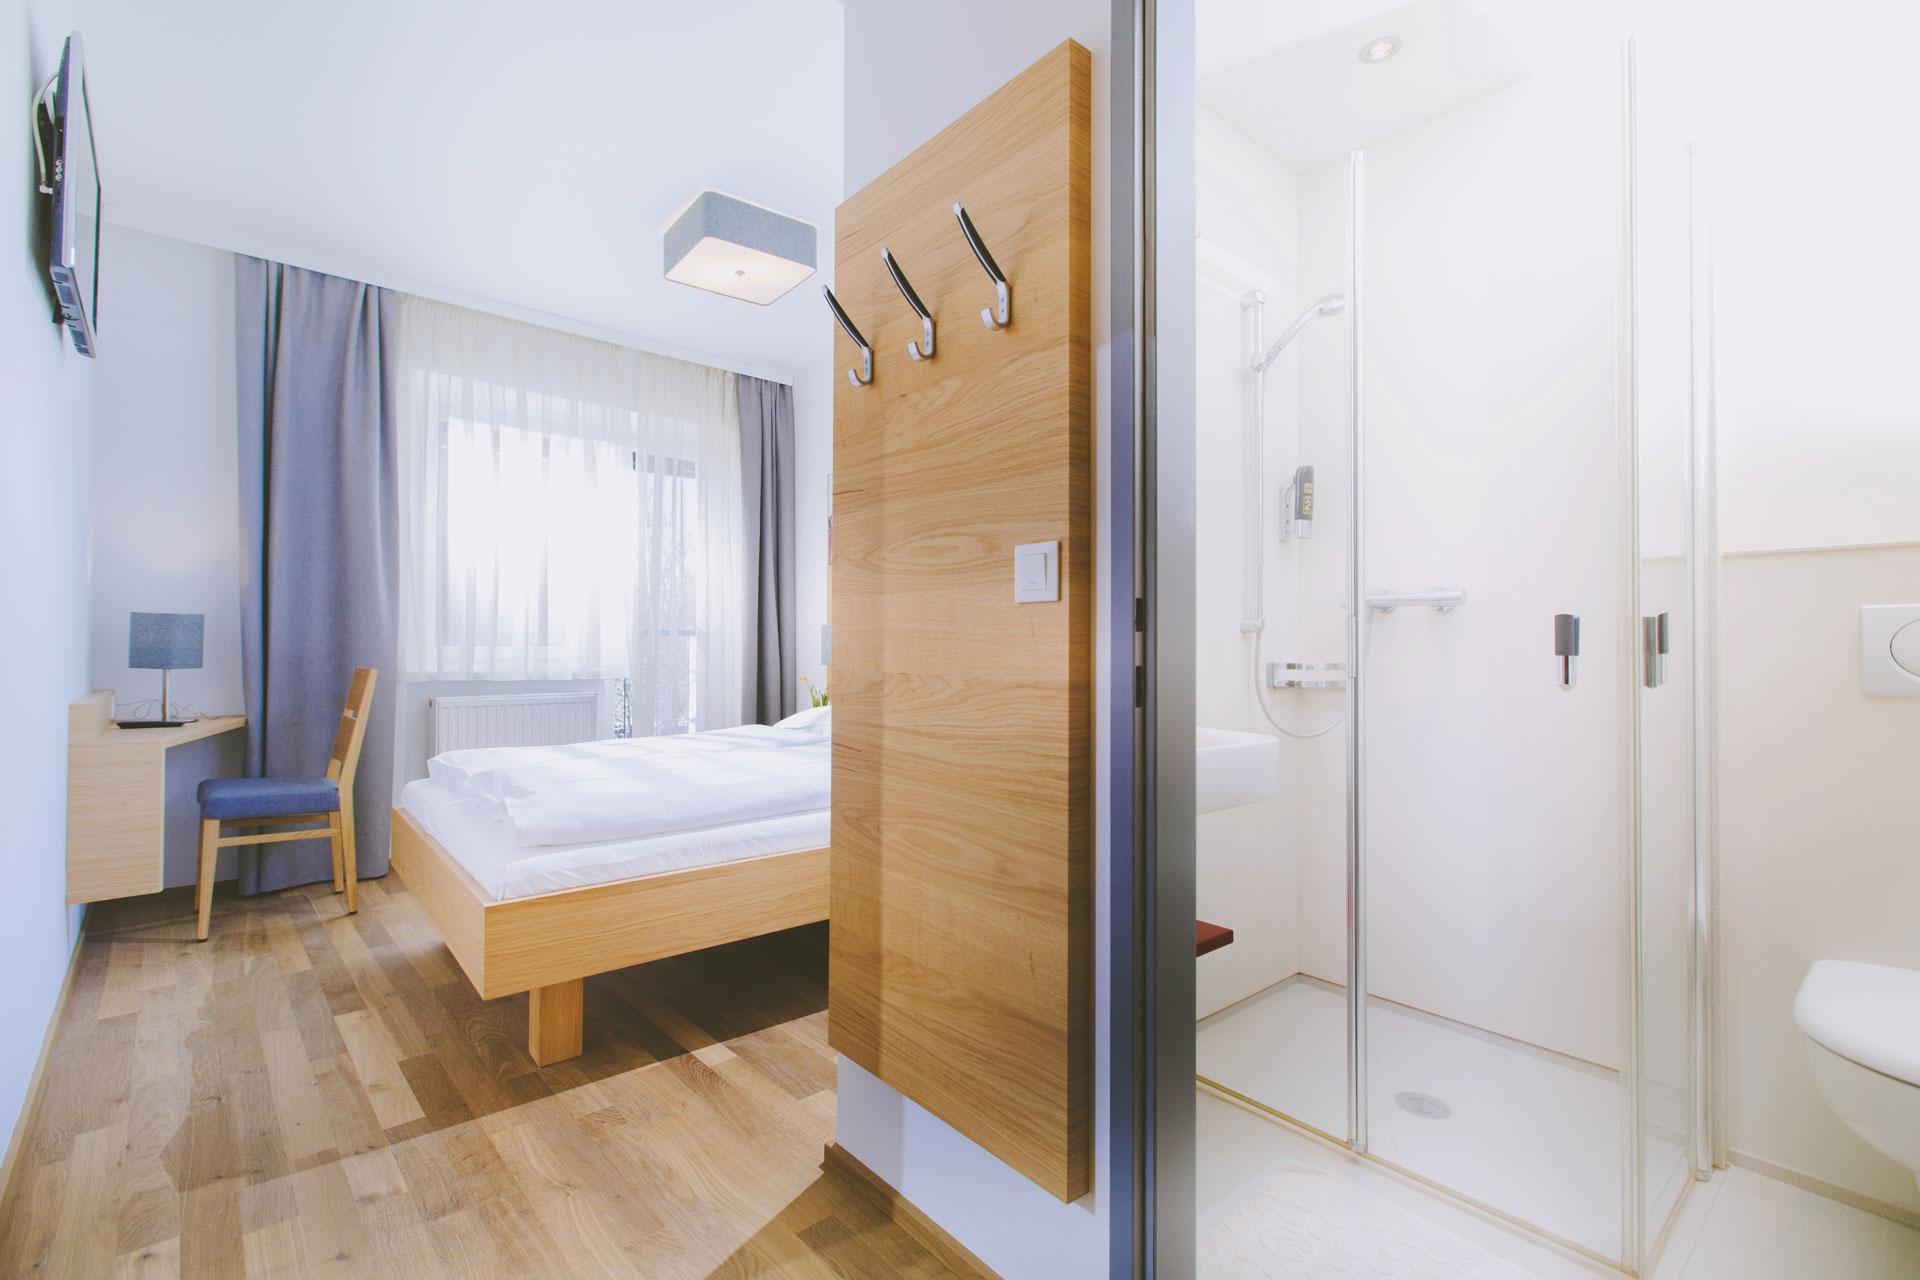 gasthof-zur-traube-doppelzimmer4